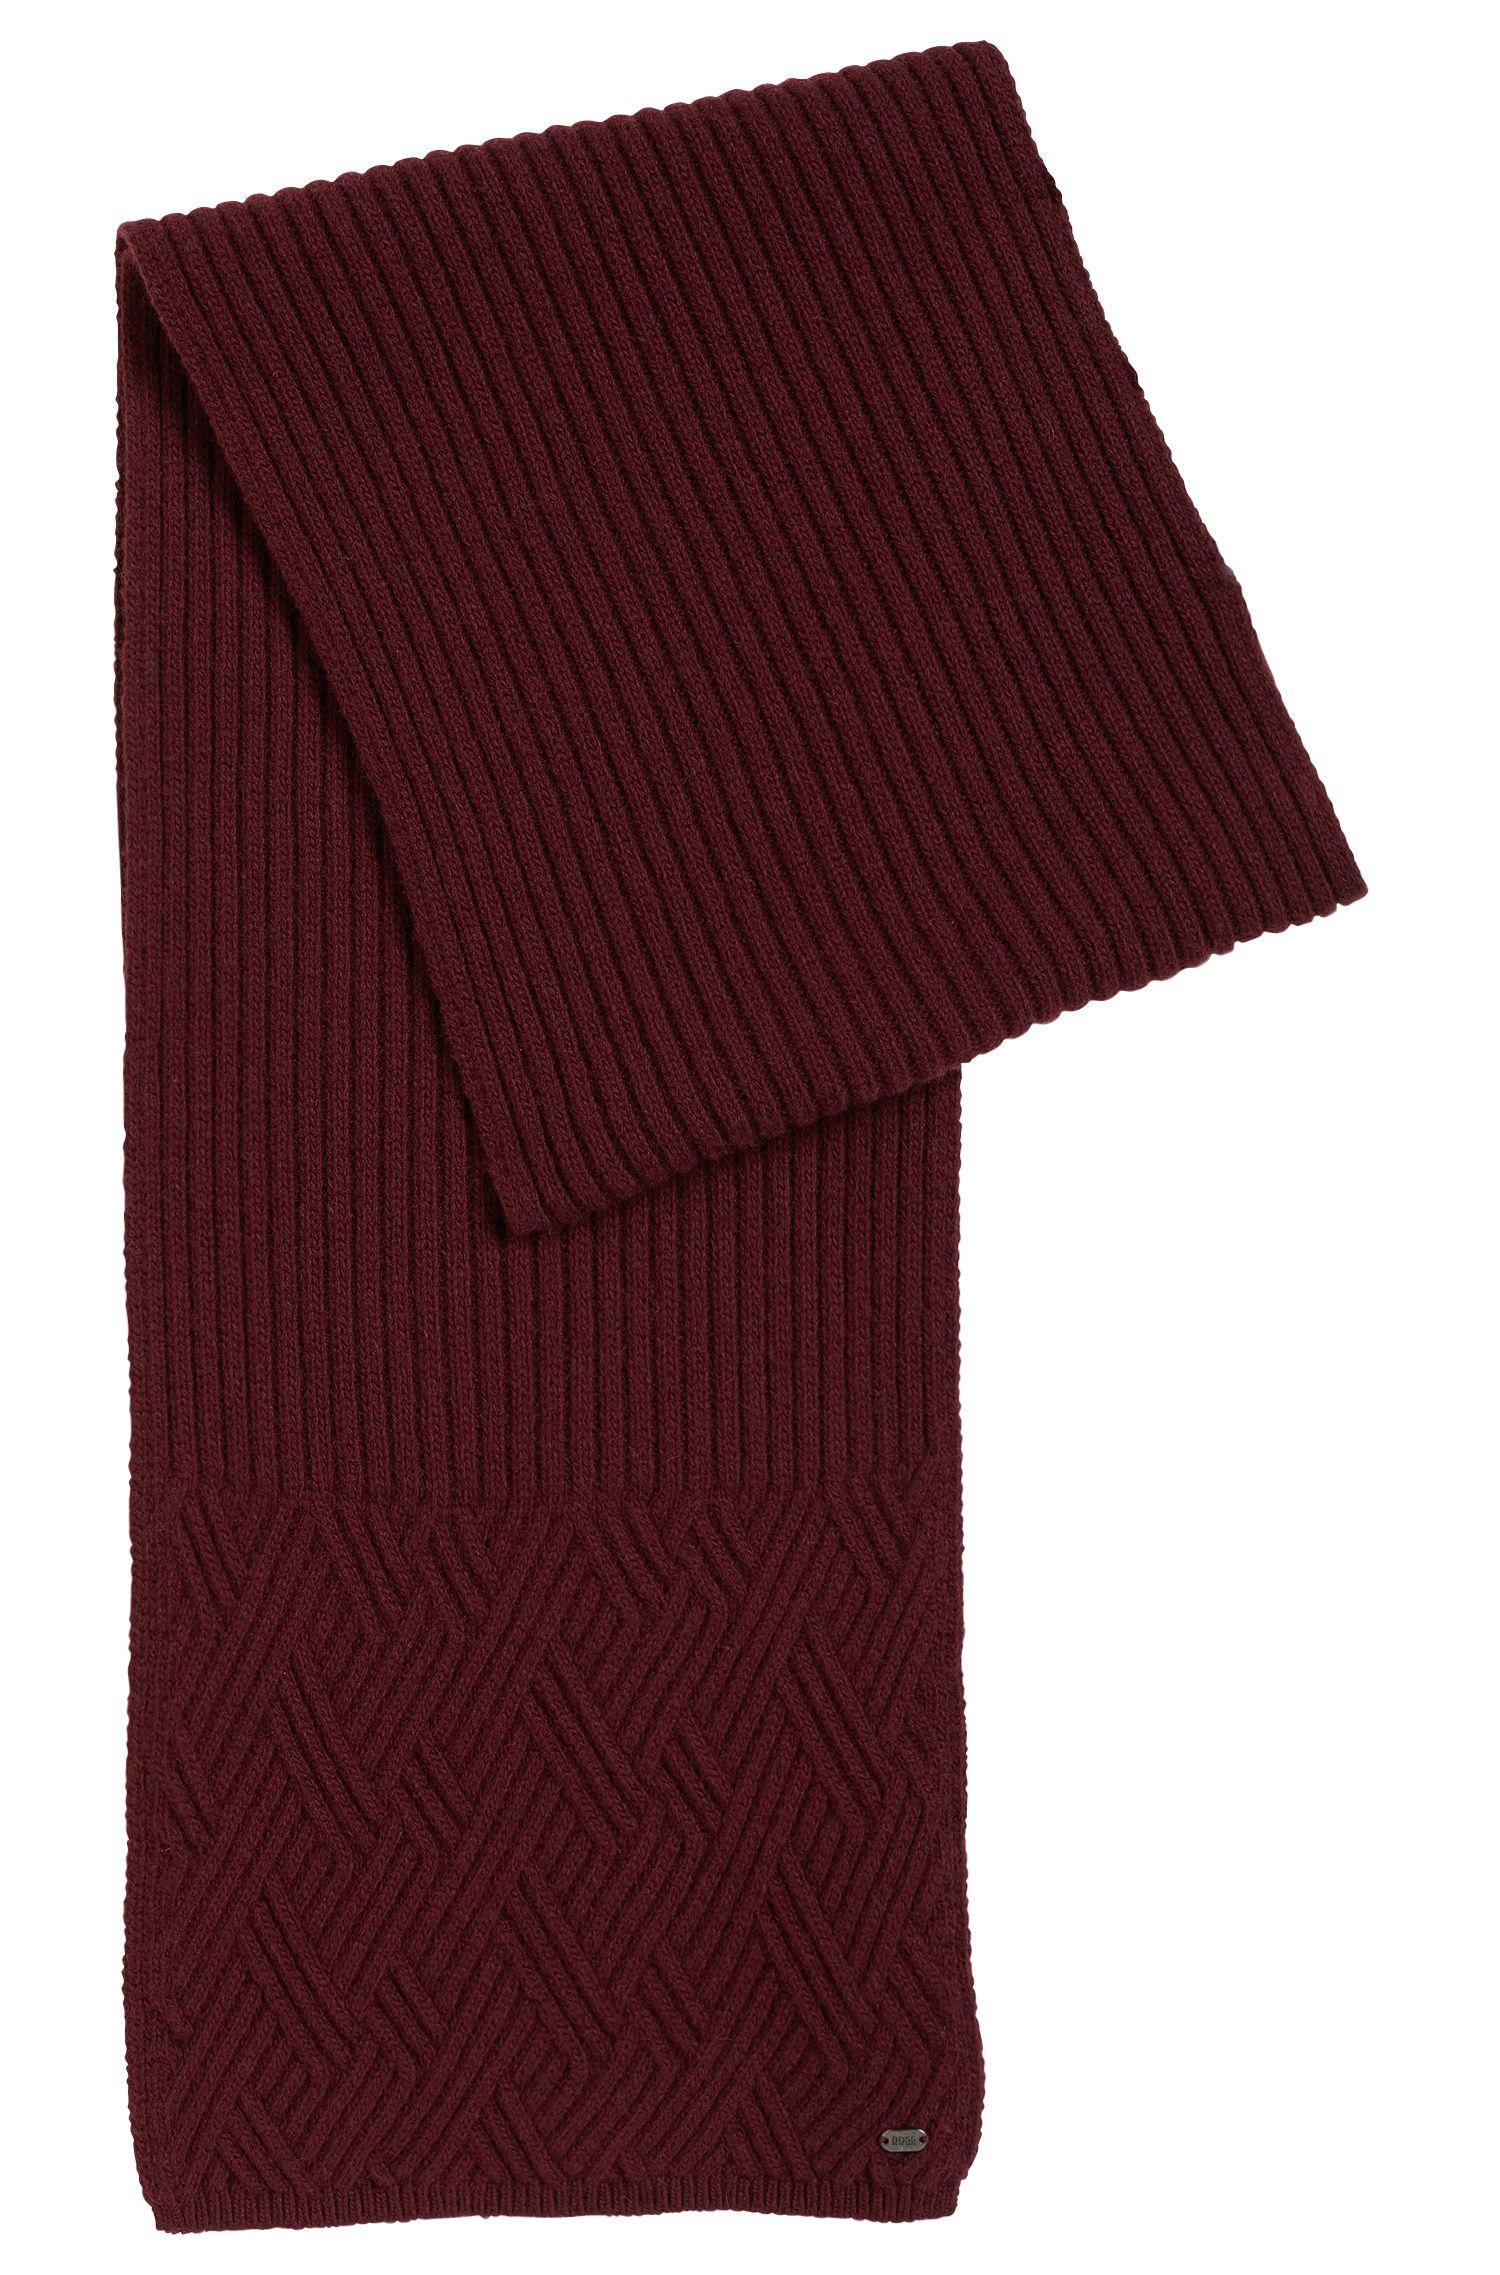 Sjaal met kabelpatroon en metalen logo, Donkerrood